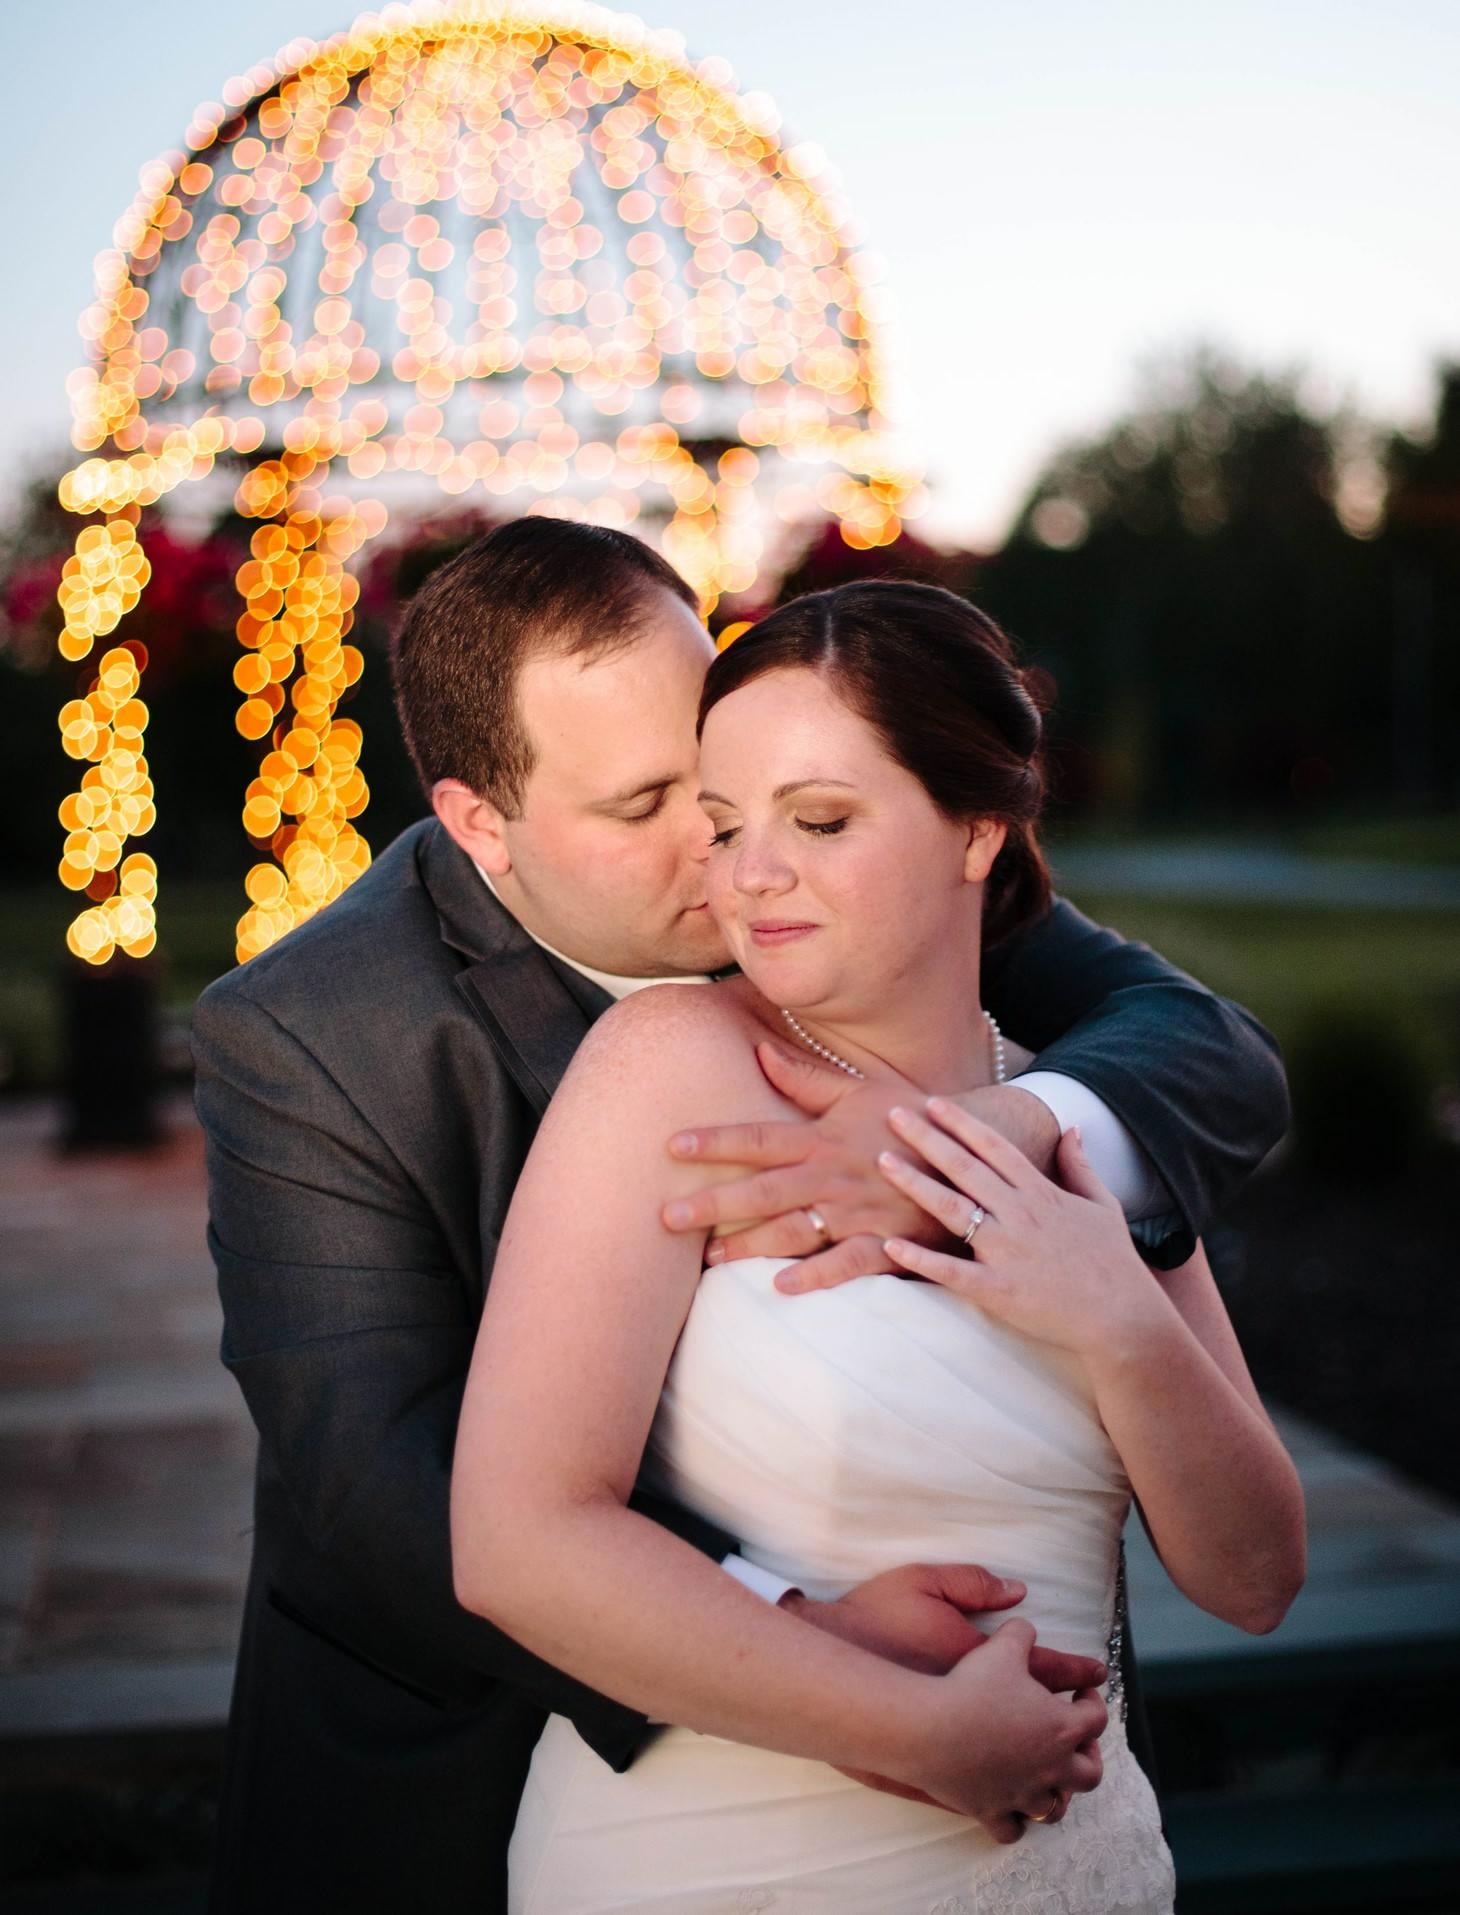 090-nyc-wedding-photographer-smitten-chickens-central-valley.jpg